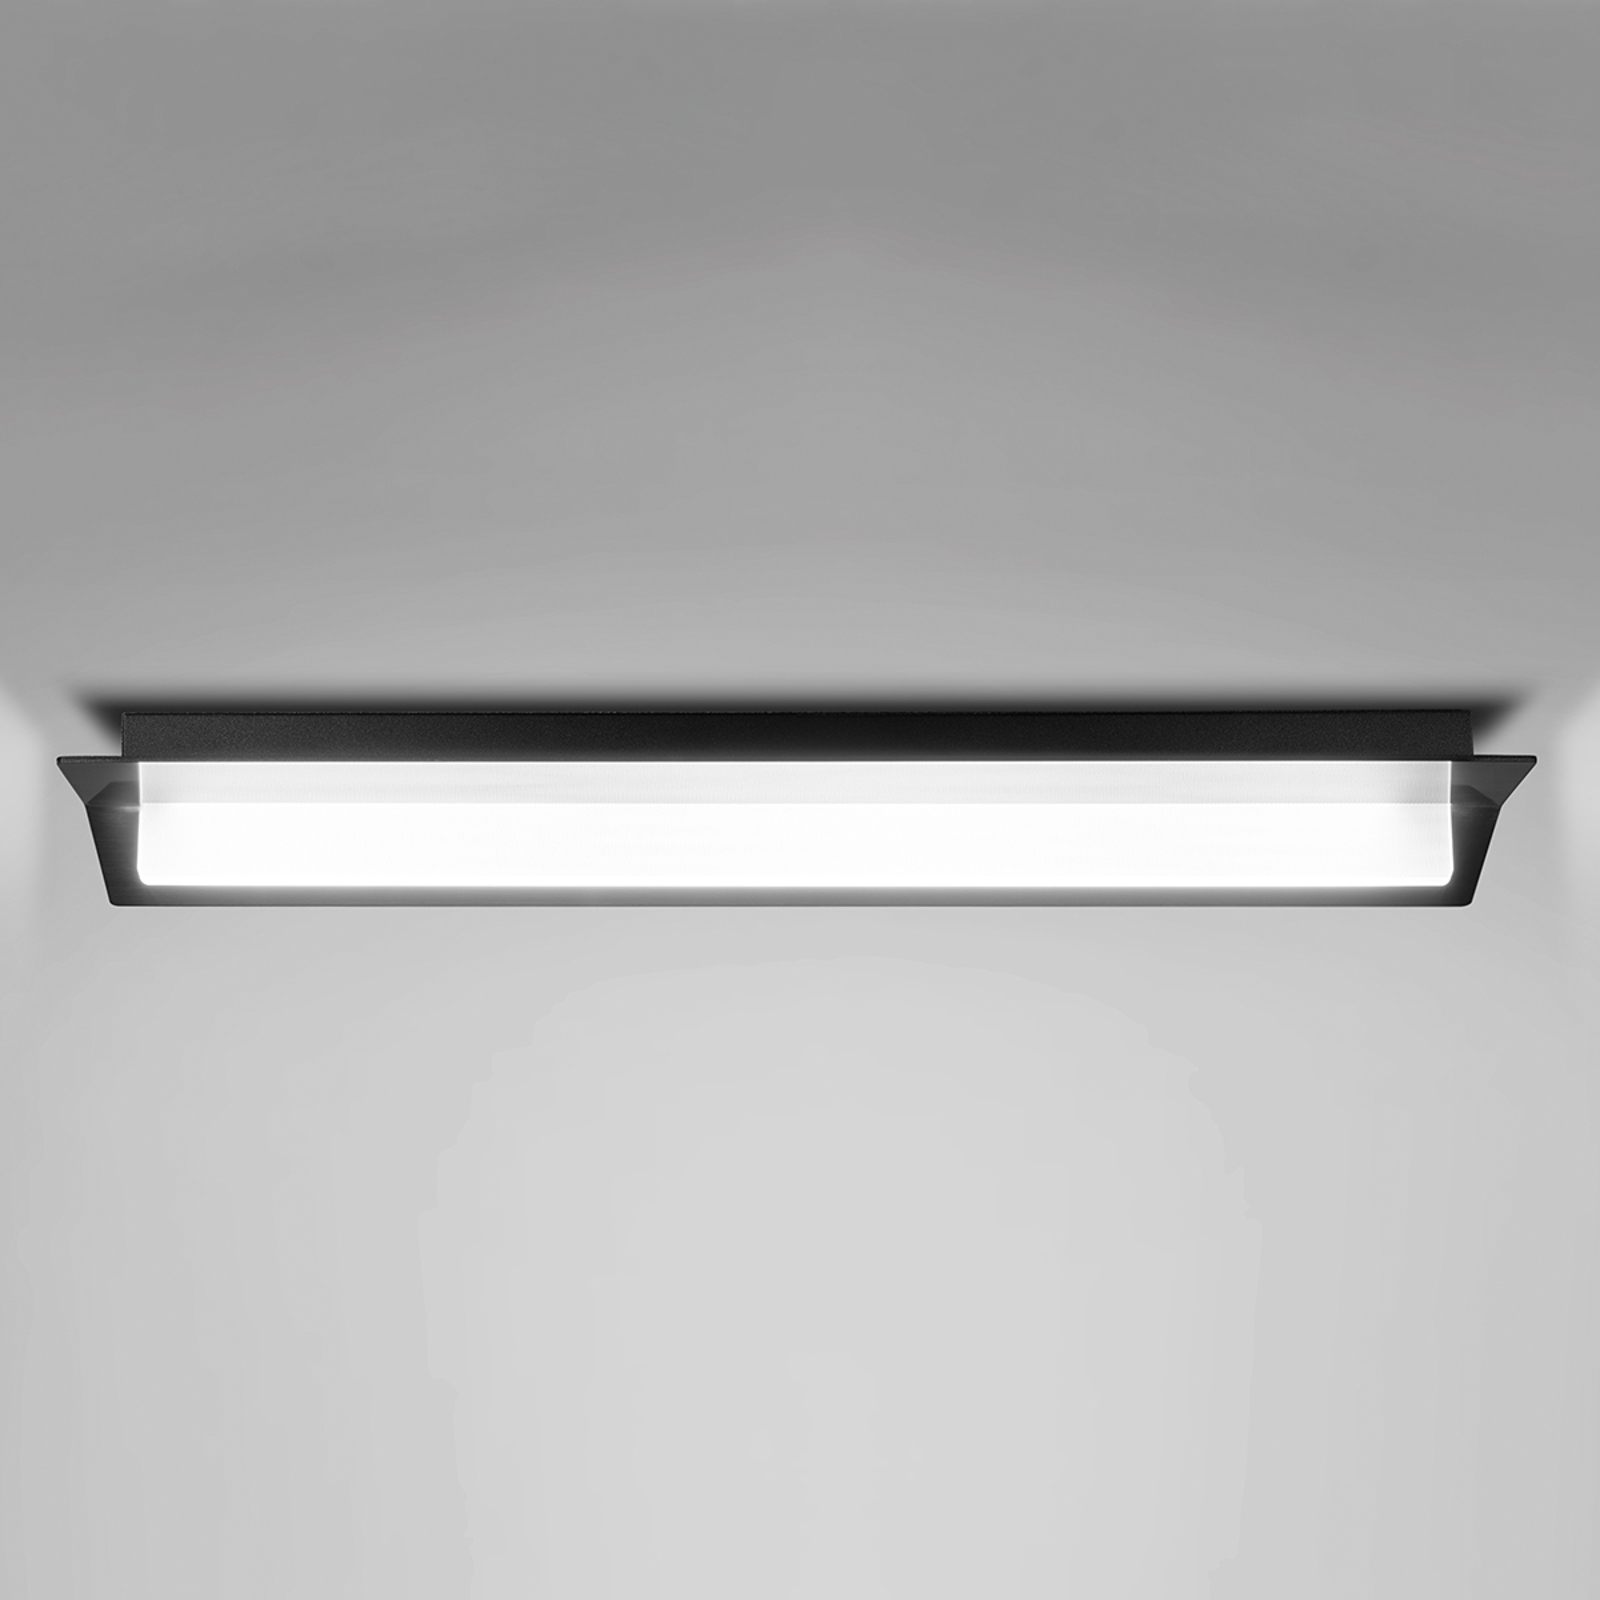 Lampa sufitowa LED Flurry, 100 cm, czarna